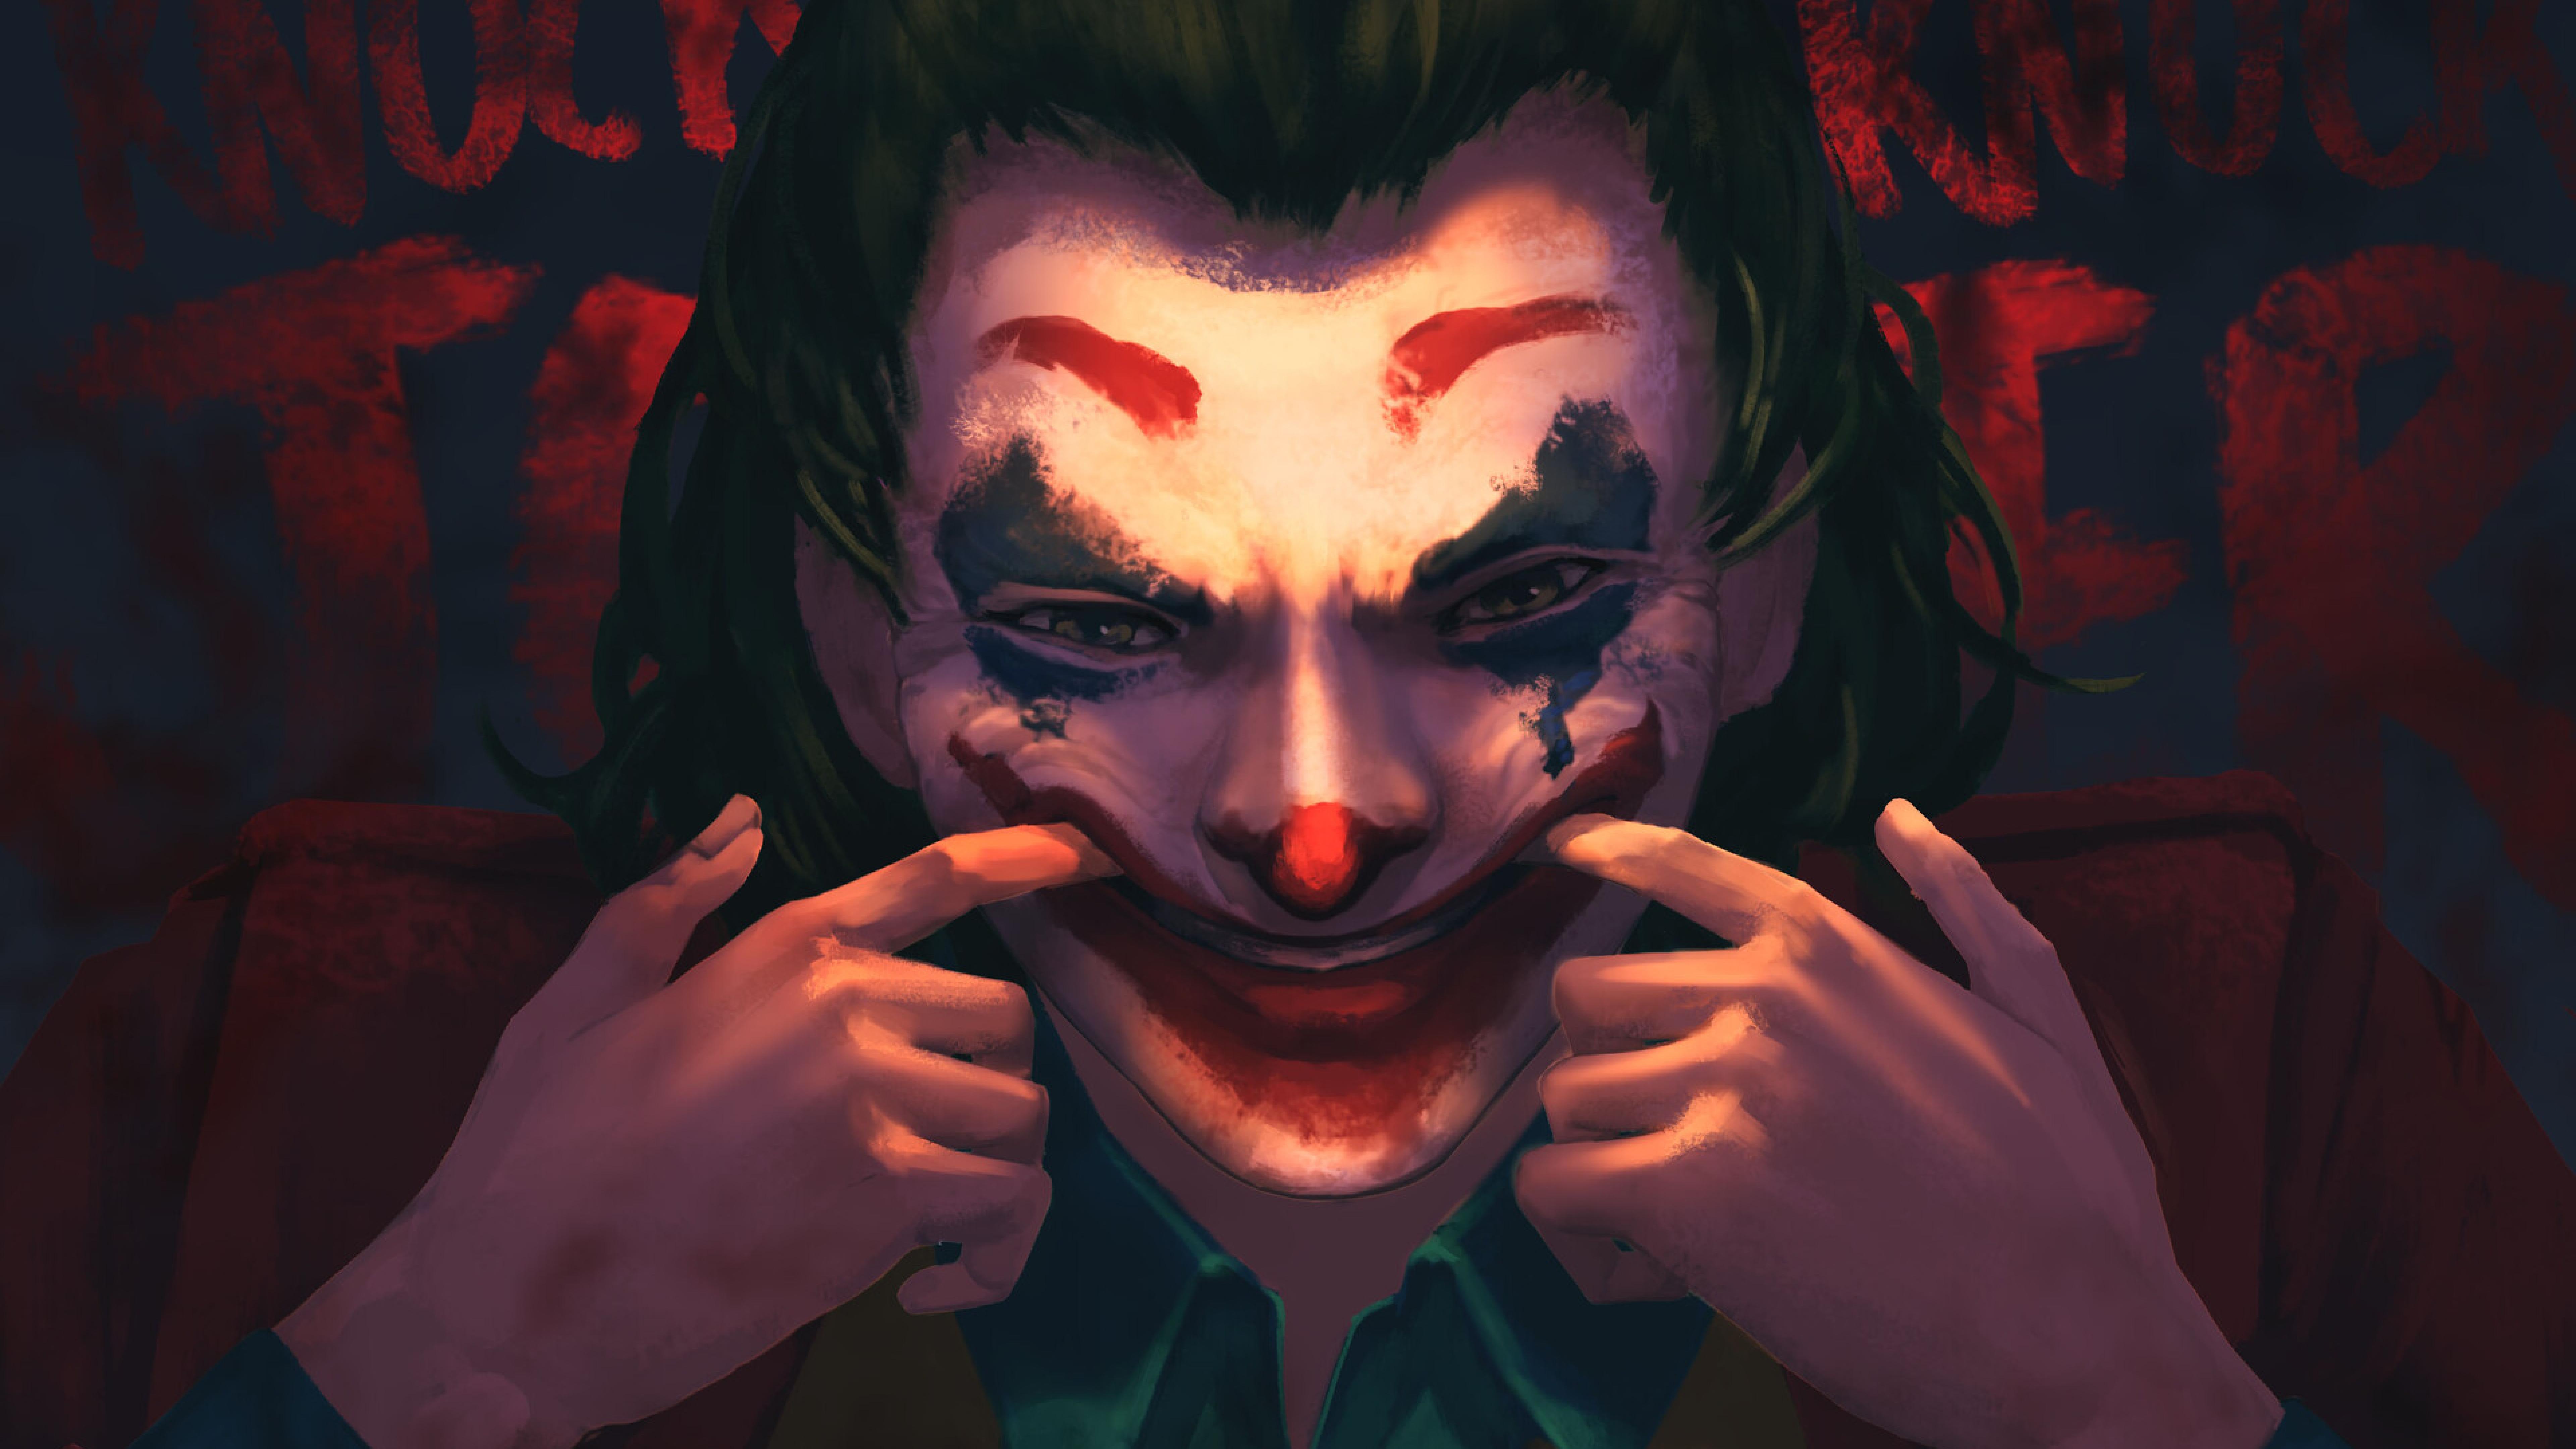 7680x4320 Joker Smiling 8K Wallpaper, HD Superheroes 4K ...